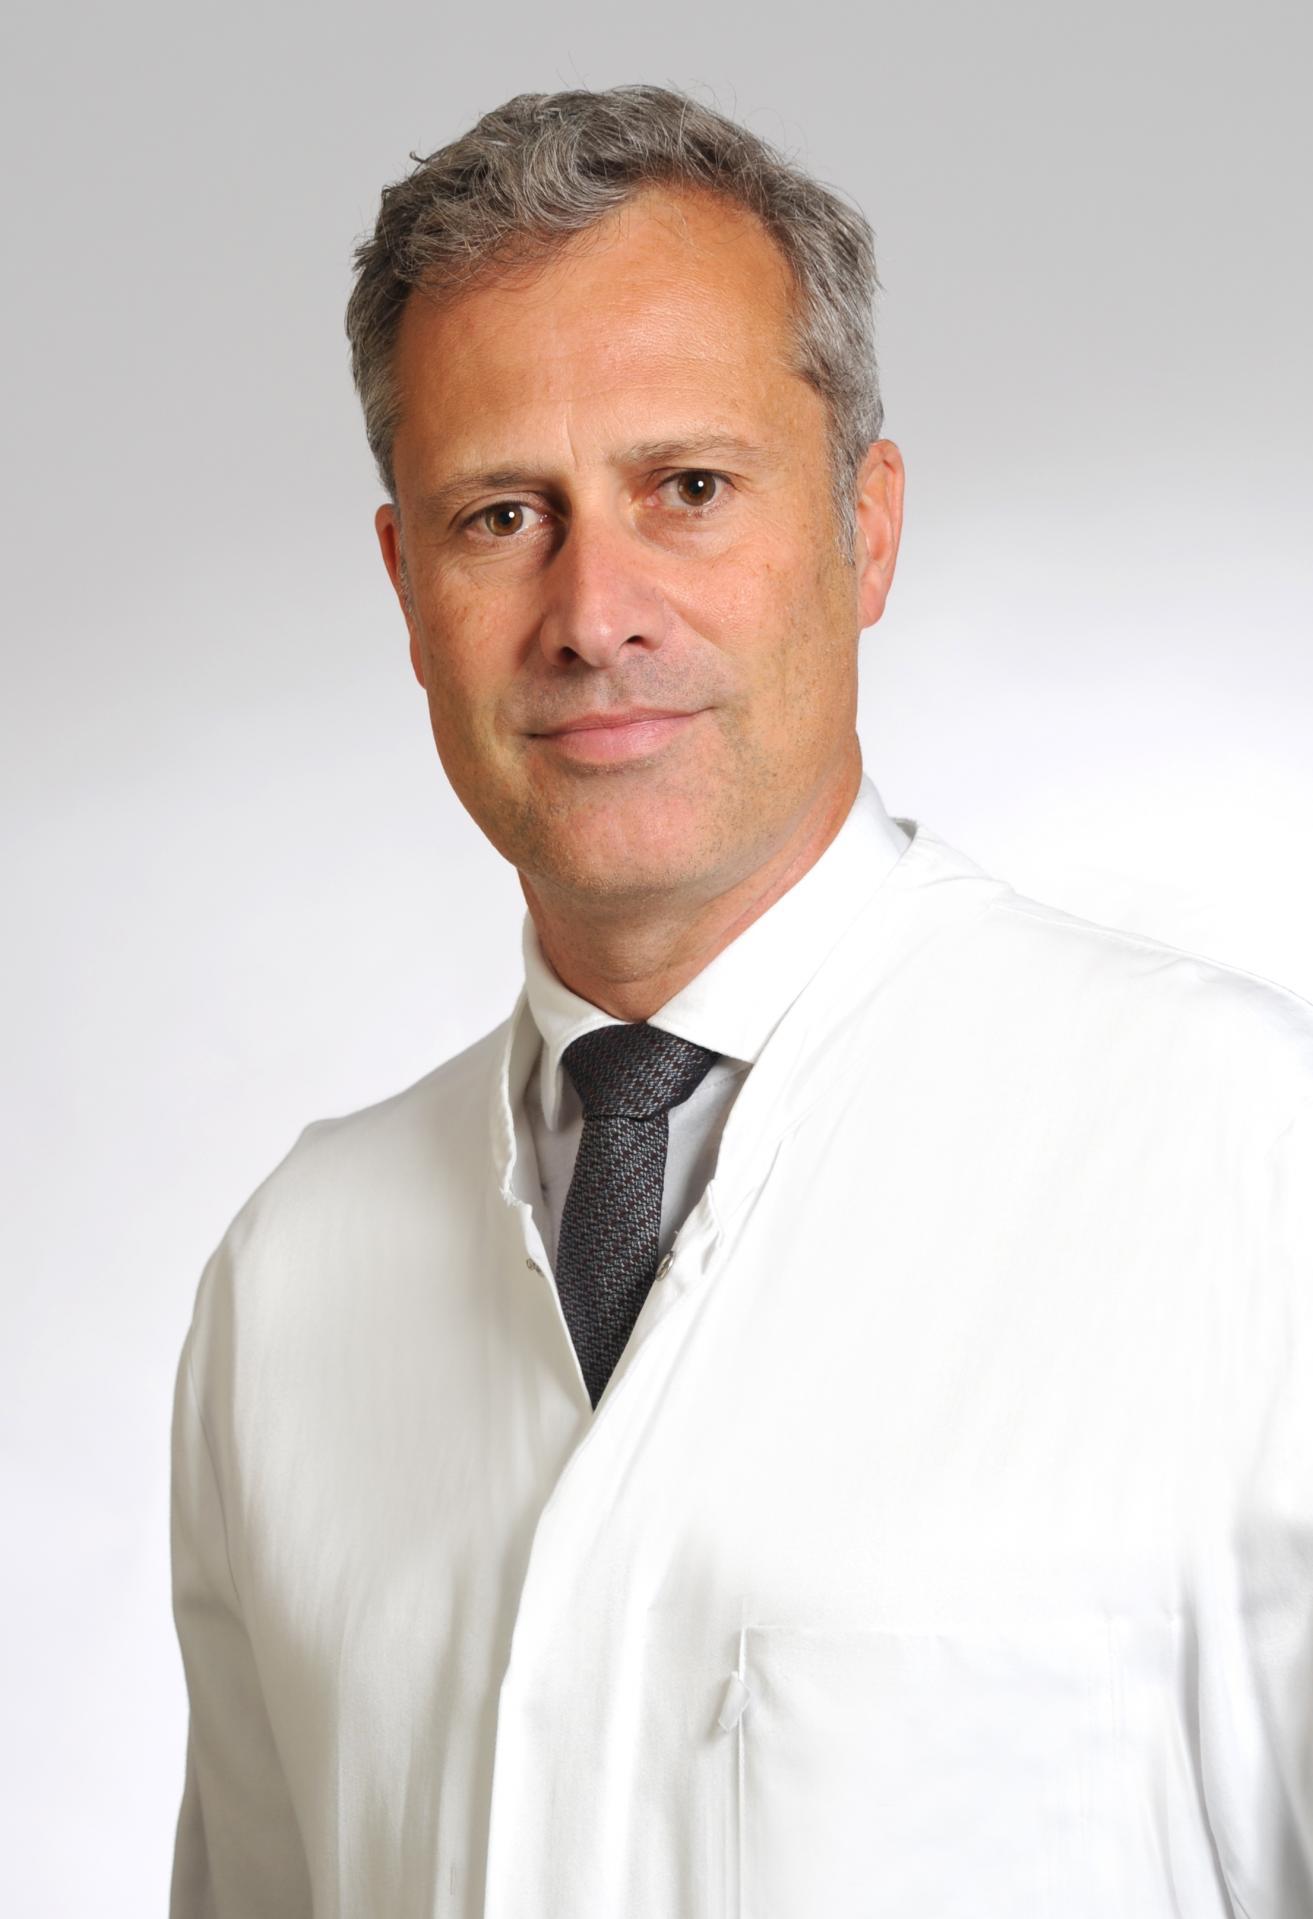 PD Dr. Ch. Lamberti